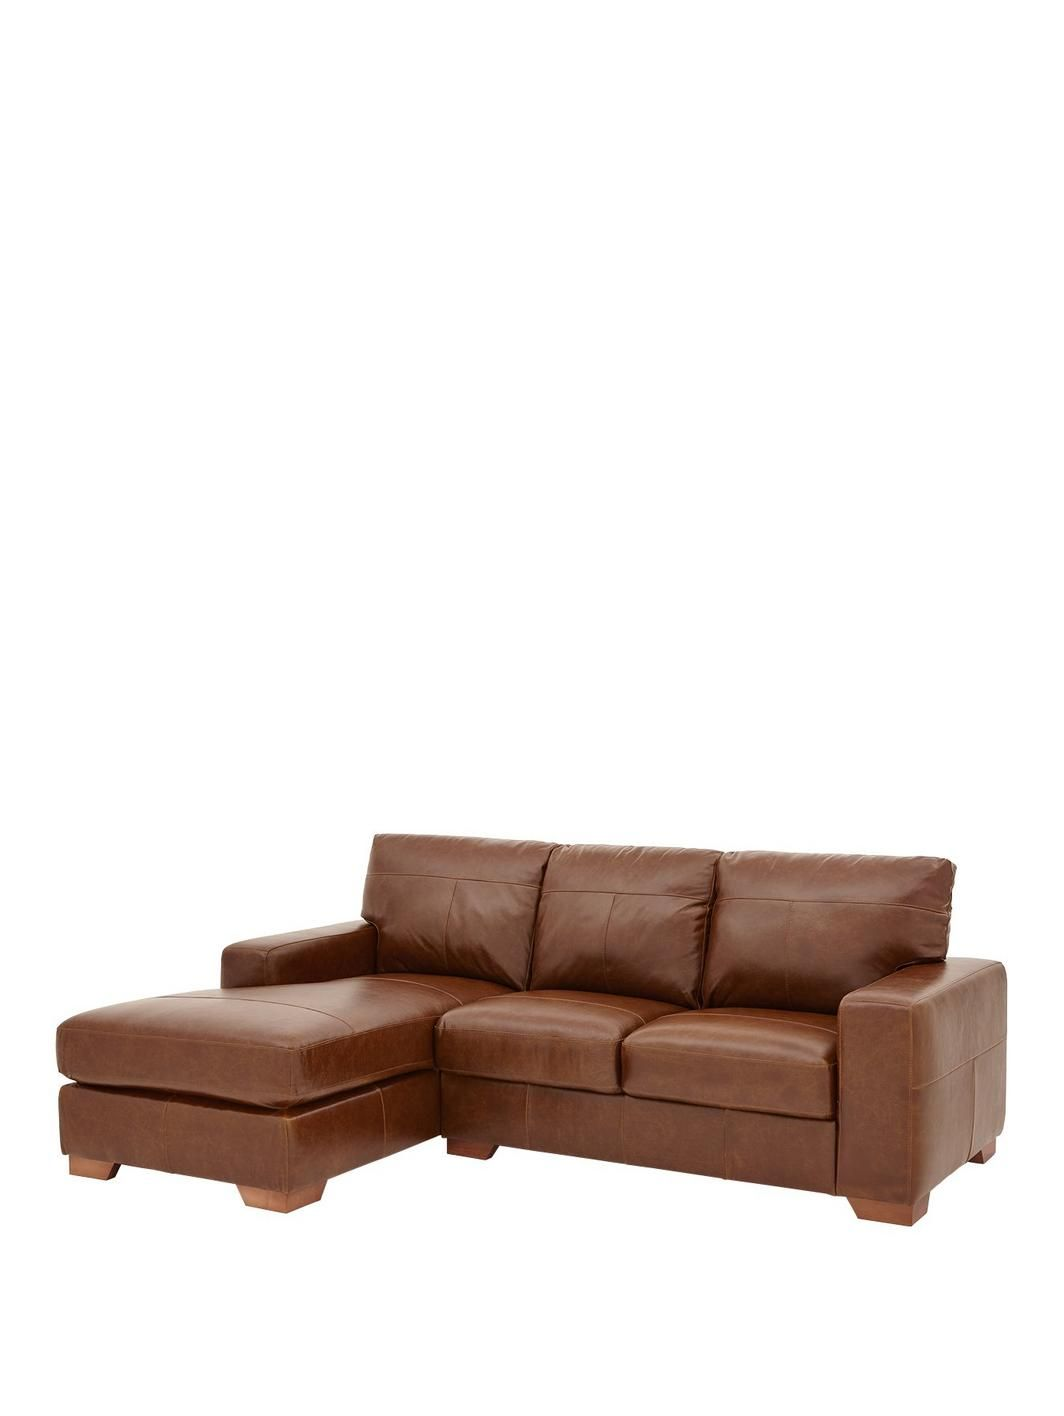 Huntington Italian Leather Left Hand Corner Chaise Sofa Http Www